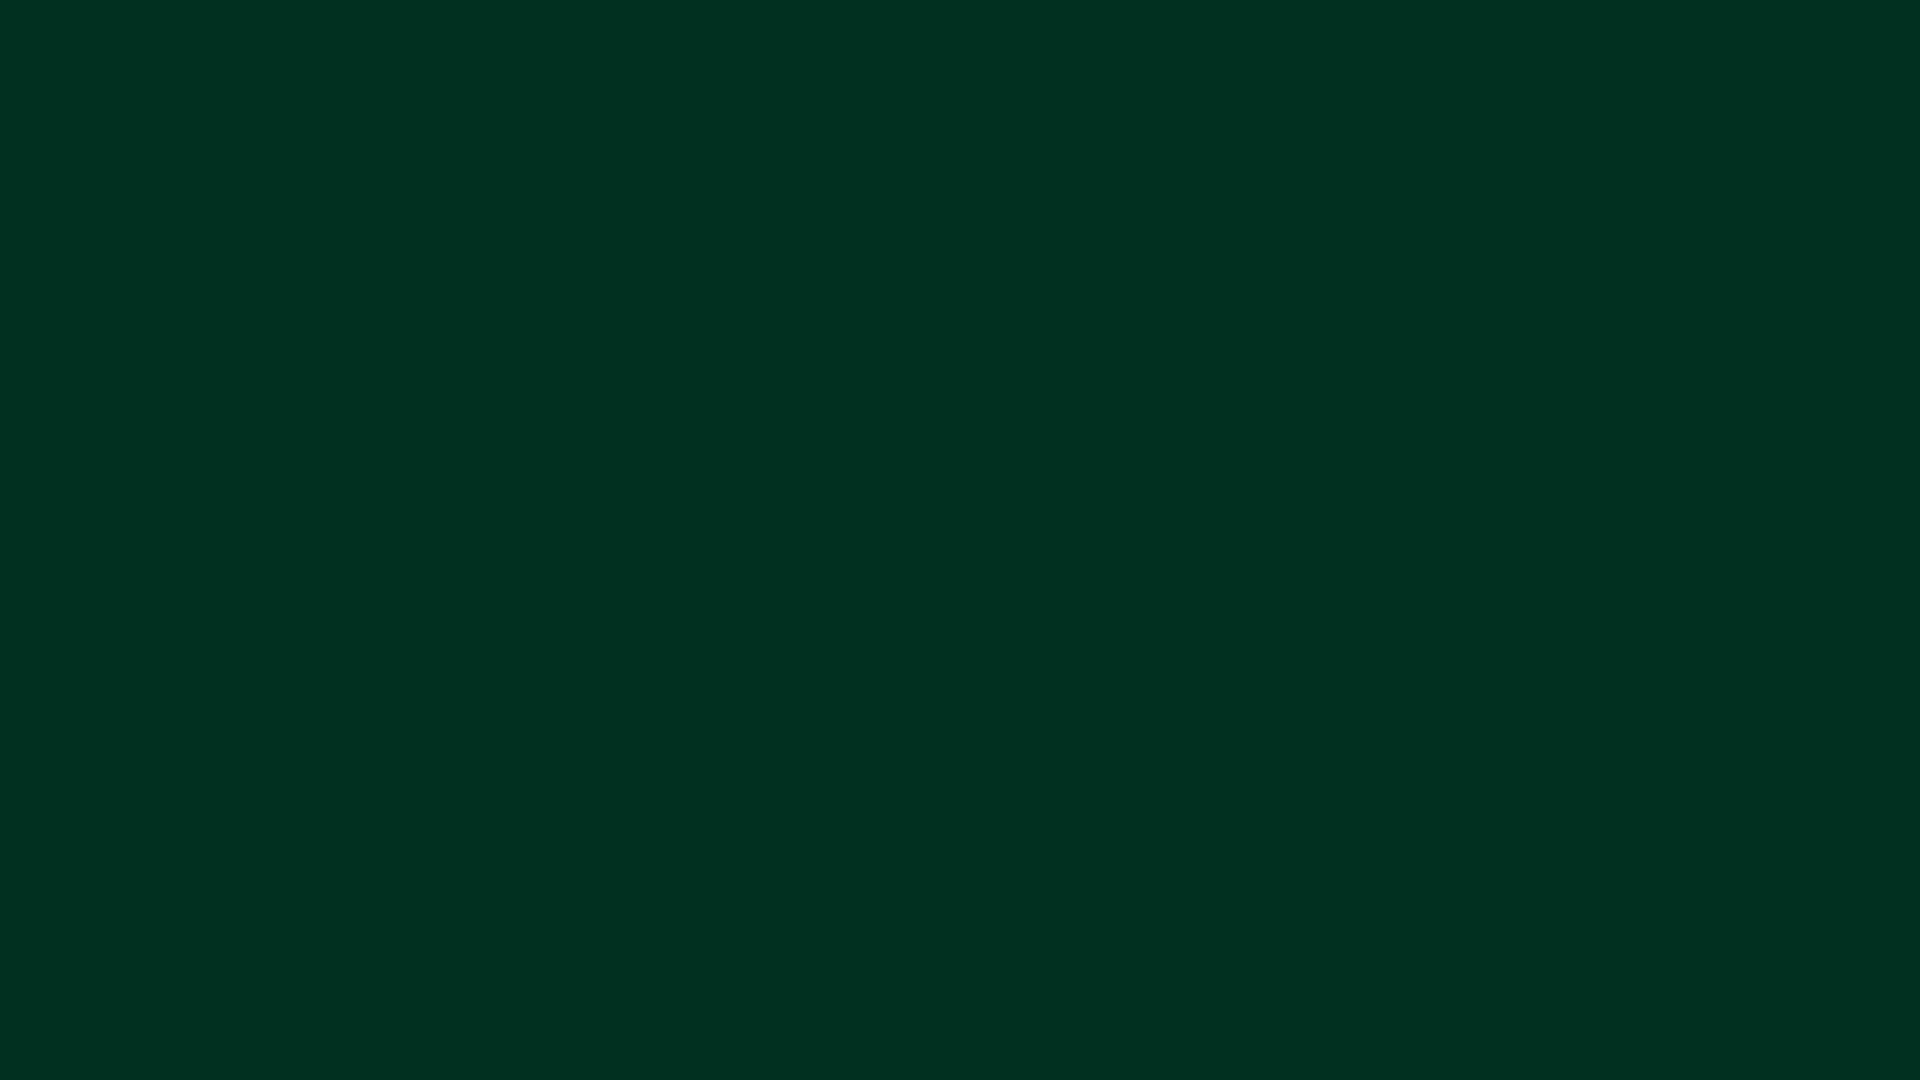 Best Dark Green Wallpaper